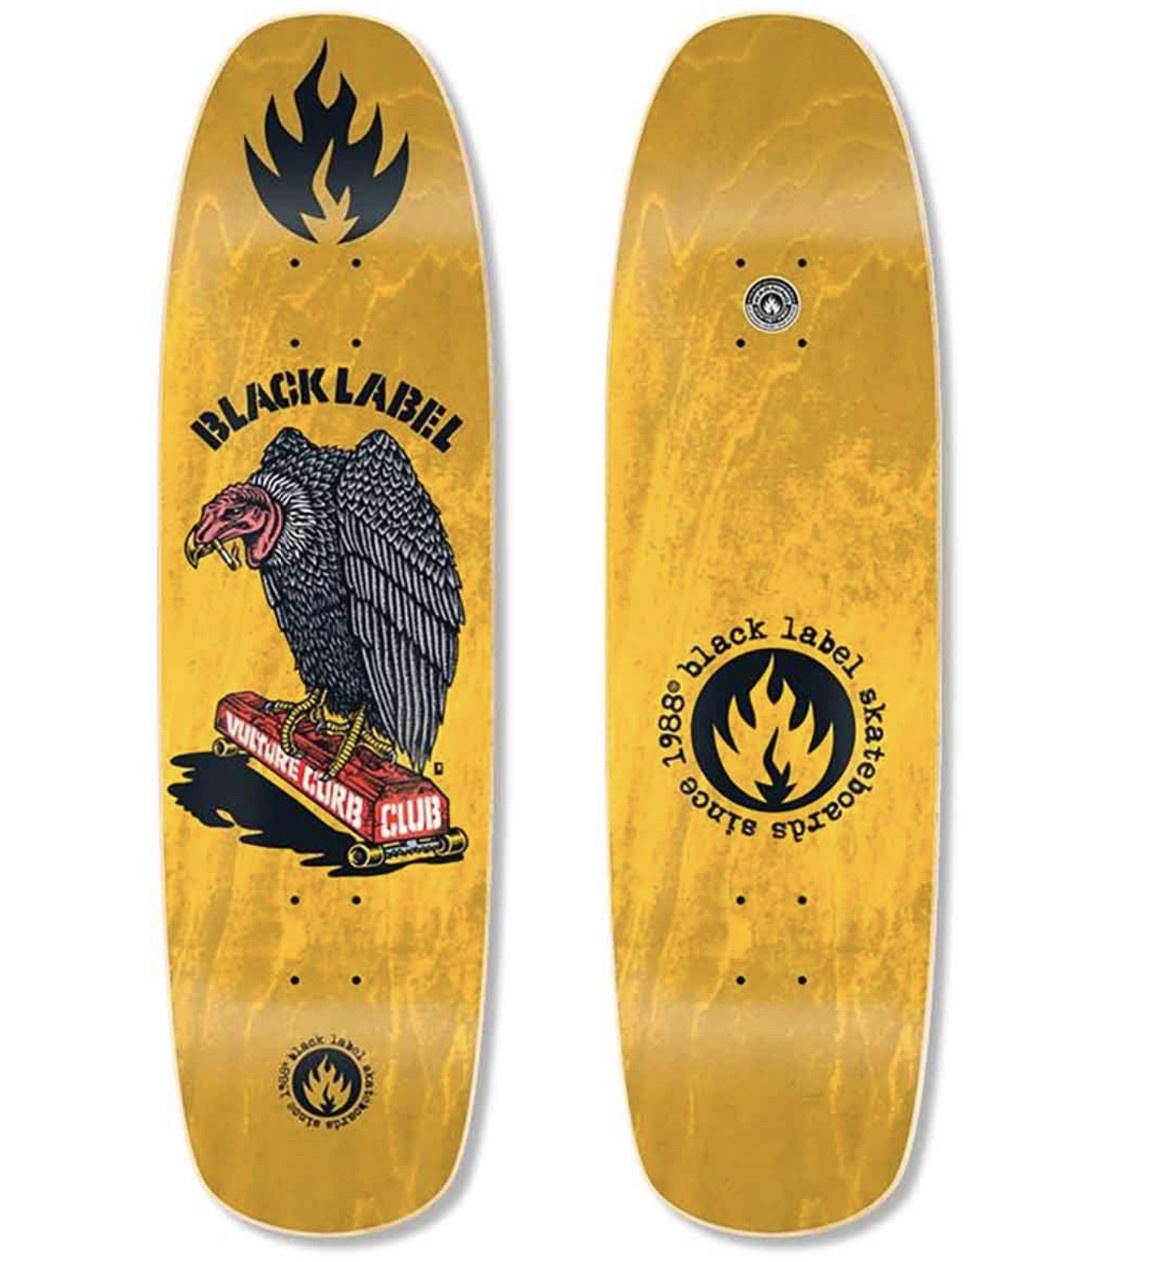 Black Label Black Label - 8.88 Vulture Curb Club Yellow